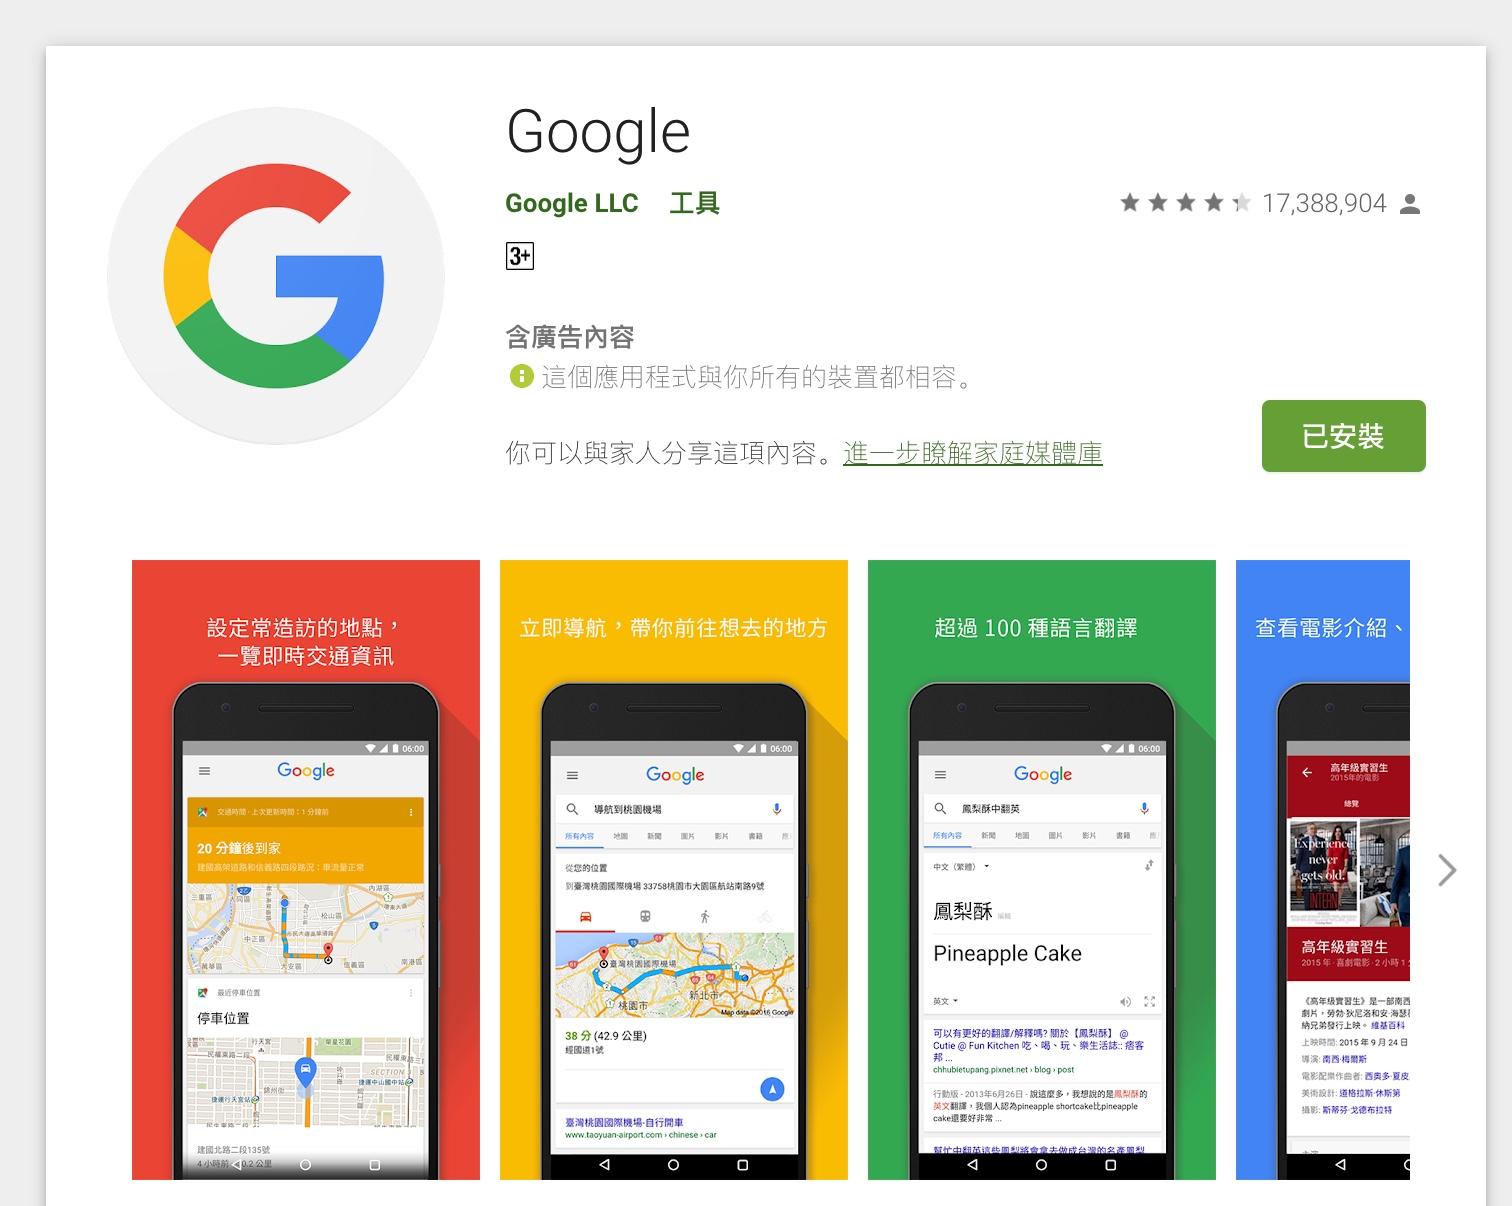 HUAWEI 手機、Android 車機、Android 後照鏡(流媒體)Google 地圖支援語音輸入